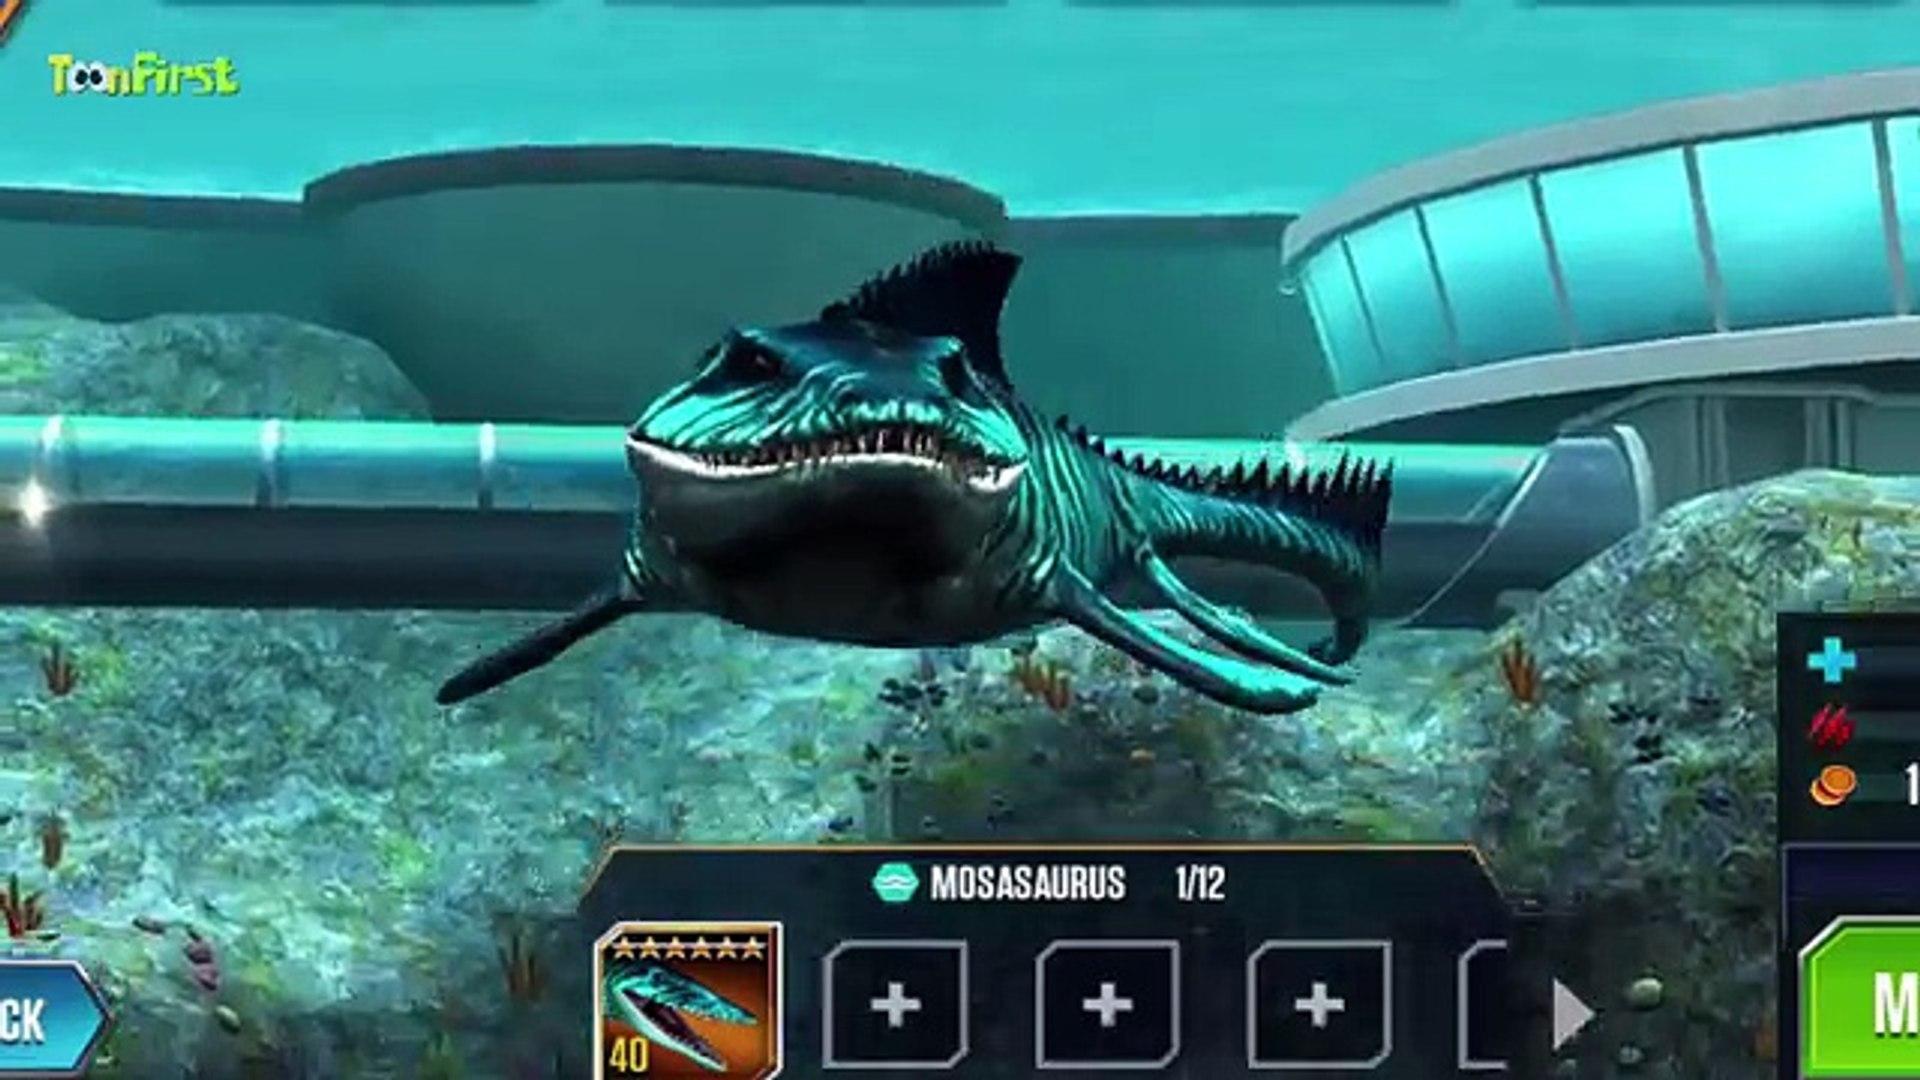 Get Mosasaurus Jurassic World Game Pics